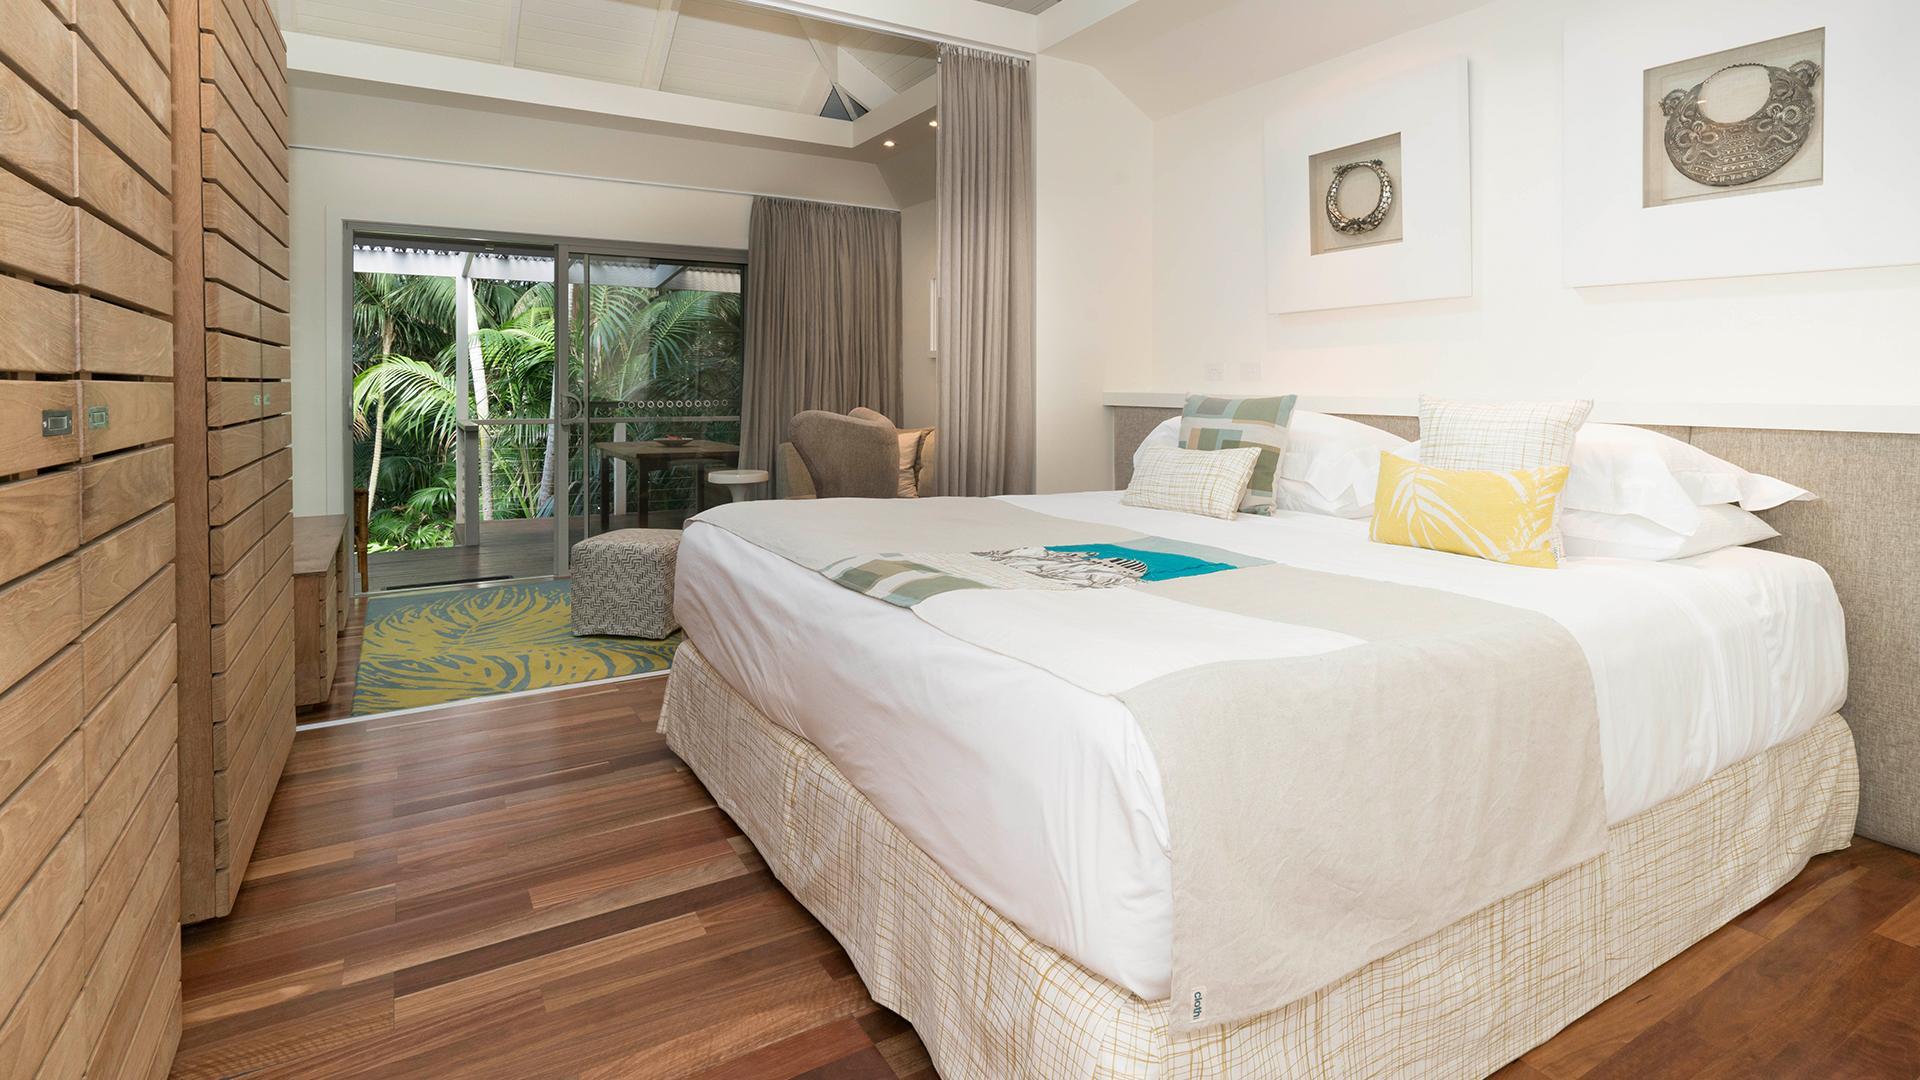 Kentia Suite image 1 at Arajilla Retreat by , New South Wales, Australia